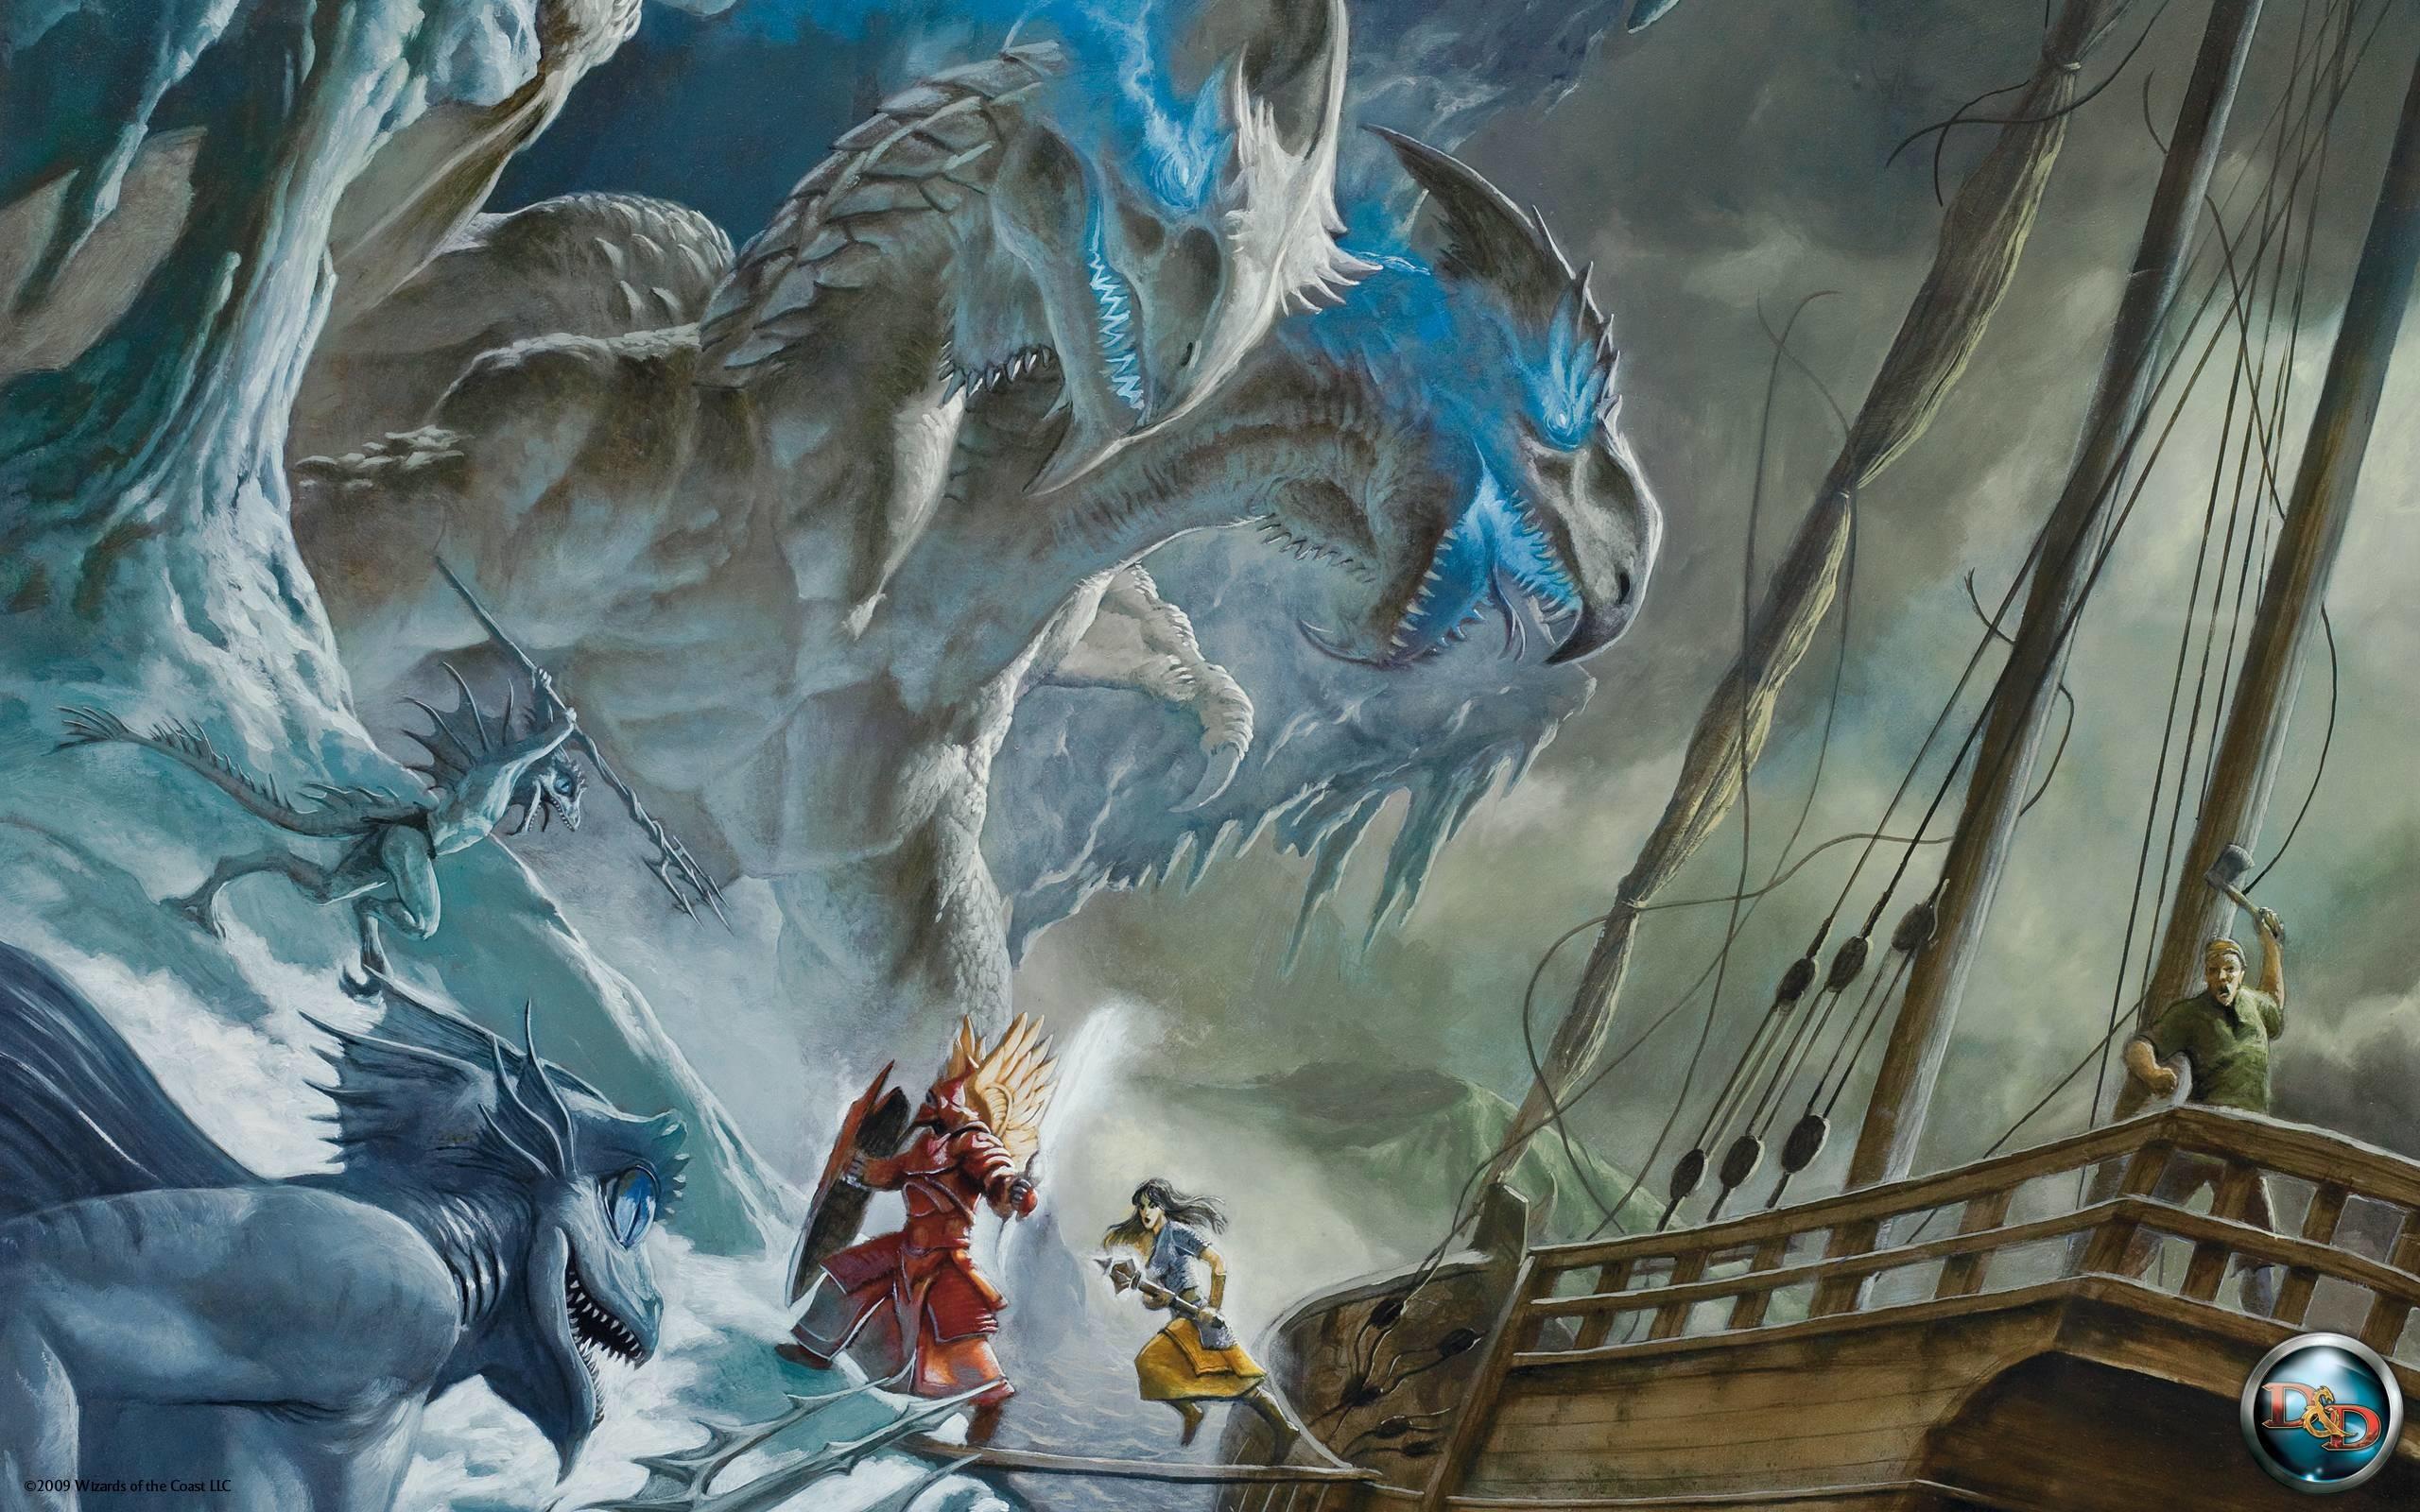 Dungeons And Dragons Wallpaper 68470 Best HD Wallpapers | Wallpaiper.